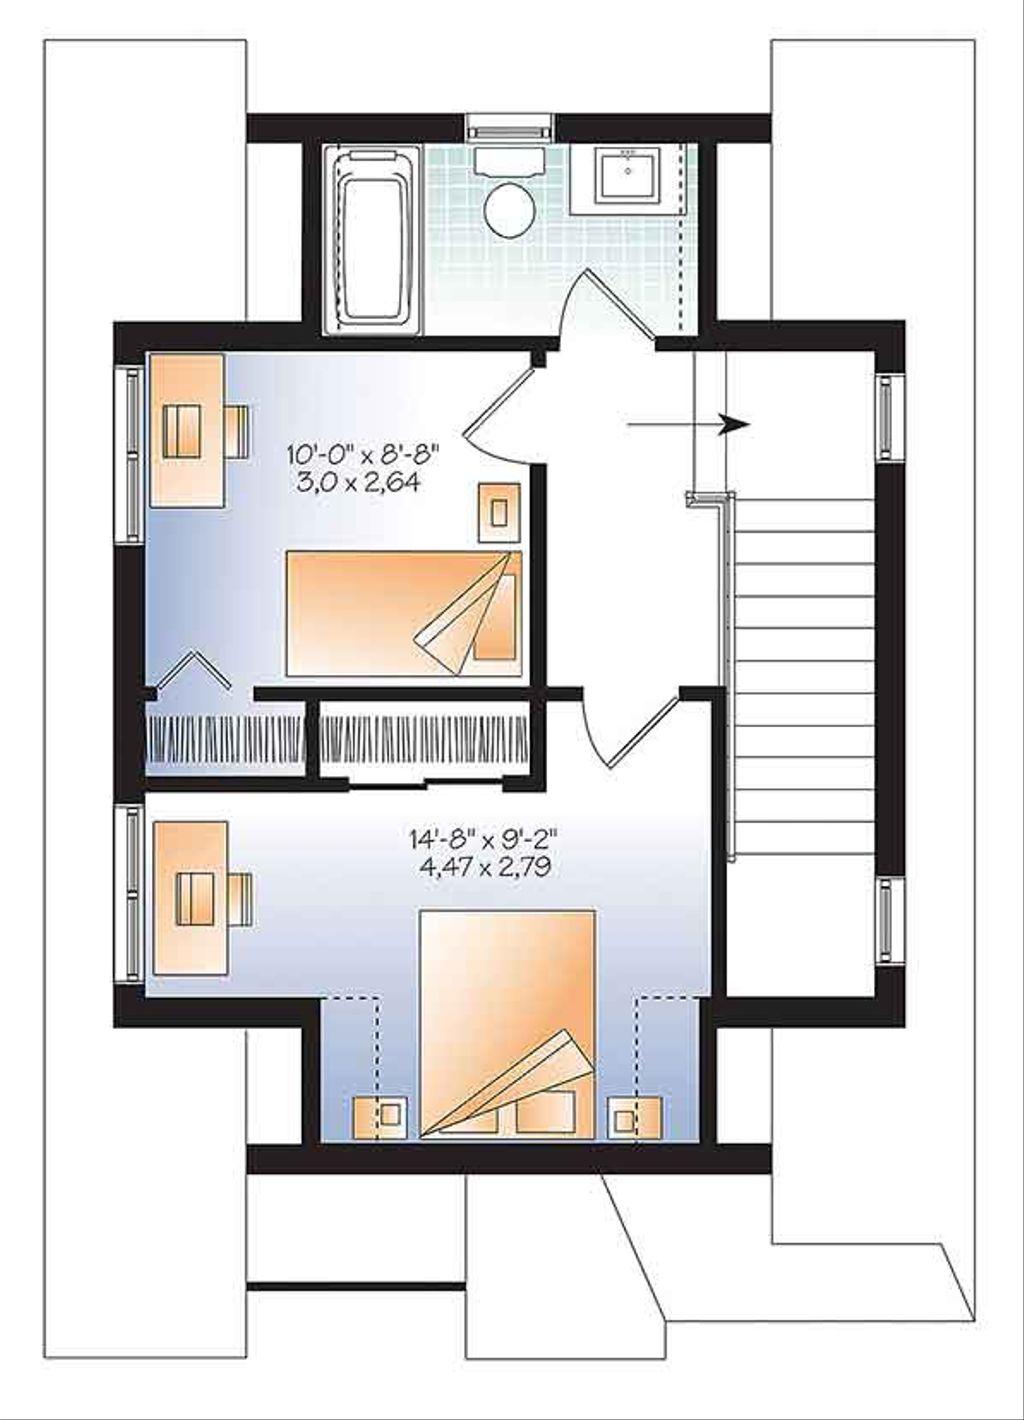 craftsman style house plan 3 beds 2 baths 943 sq ft plan 23